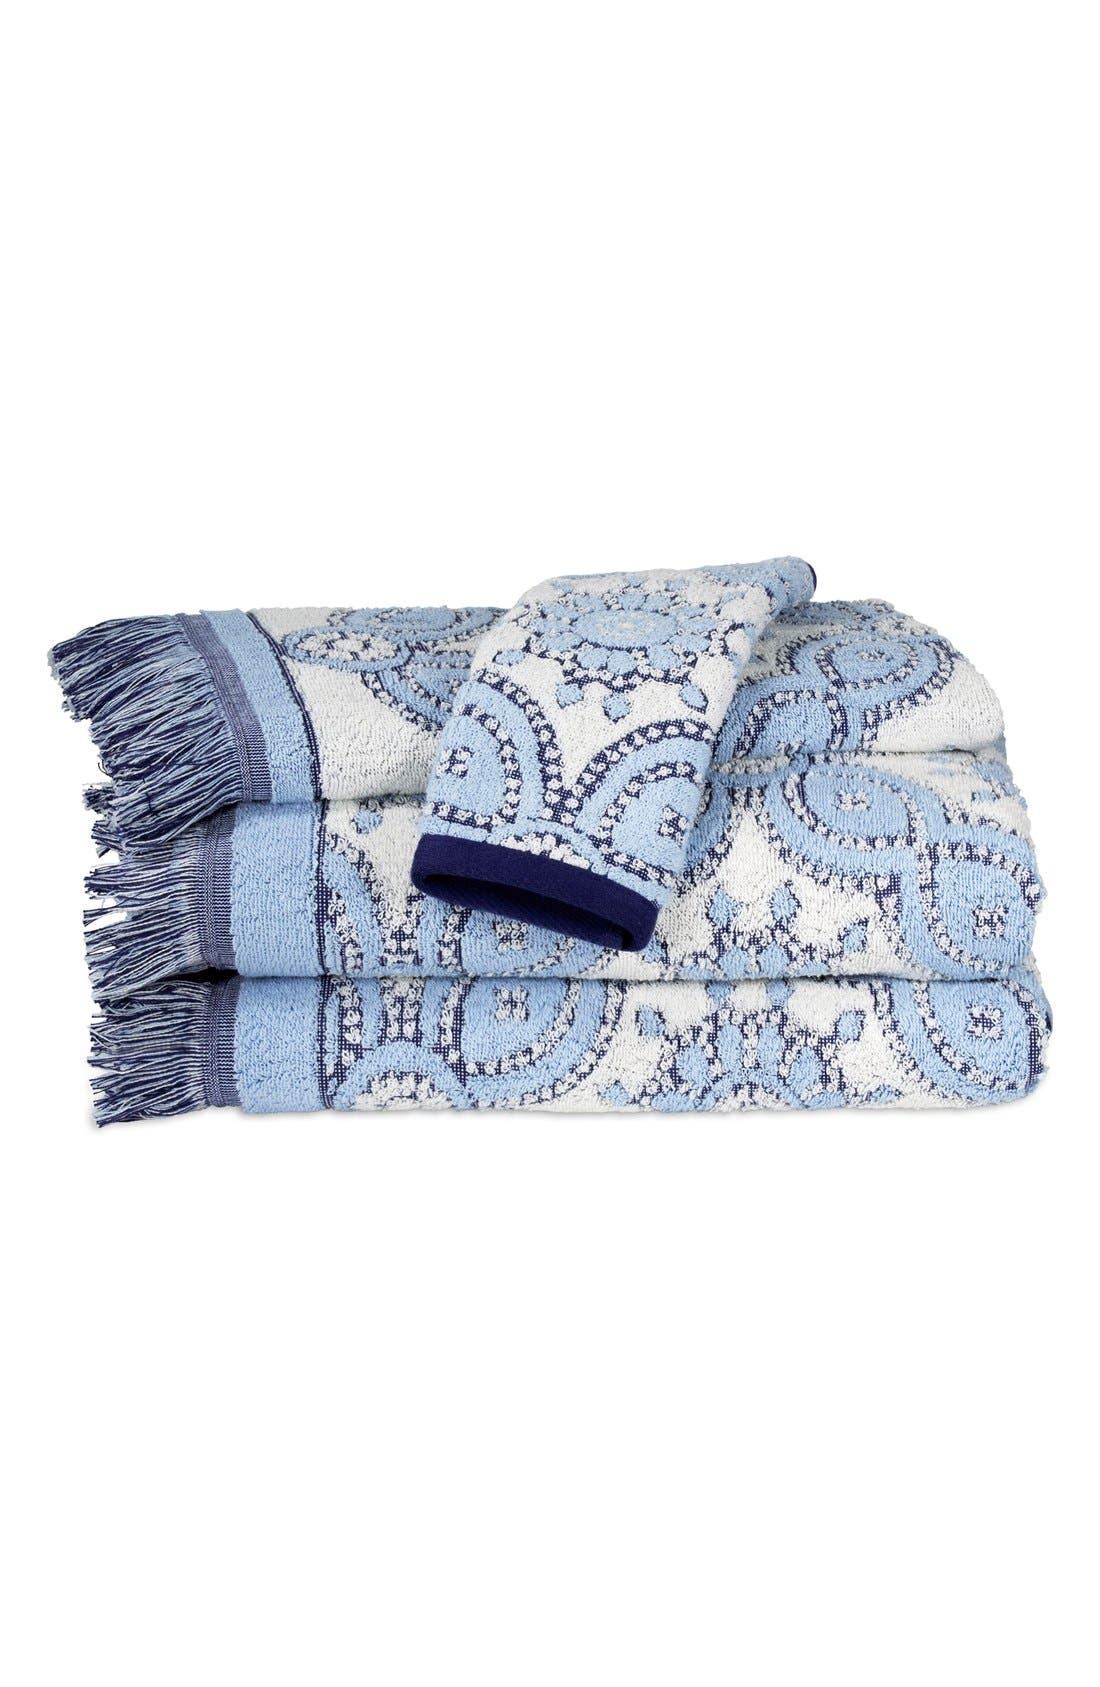 'Petra' Cotton Bath Towel,                             Main thumbnail 1, color,                             Light Indigo